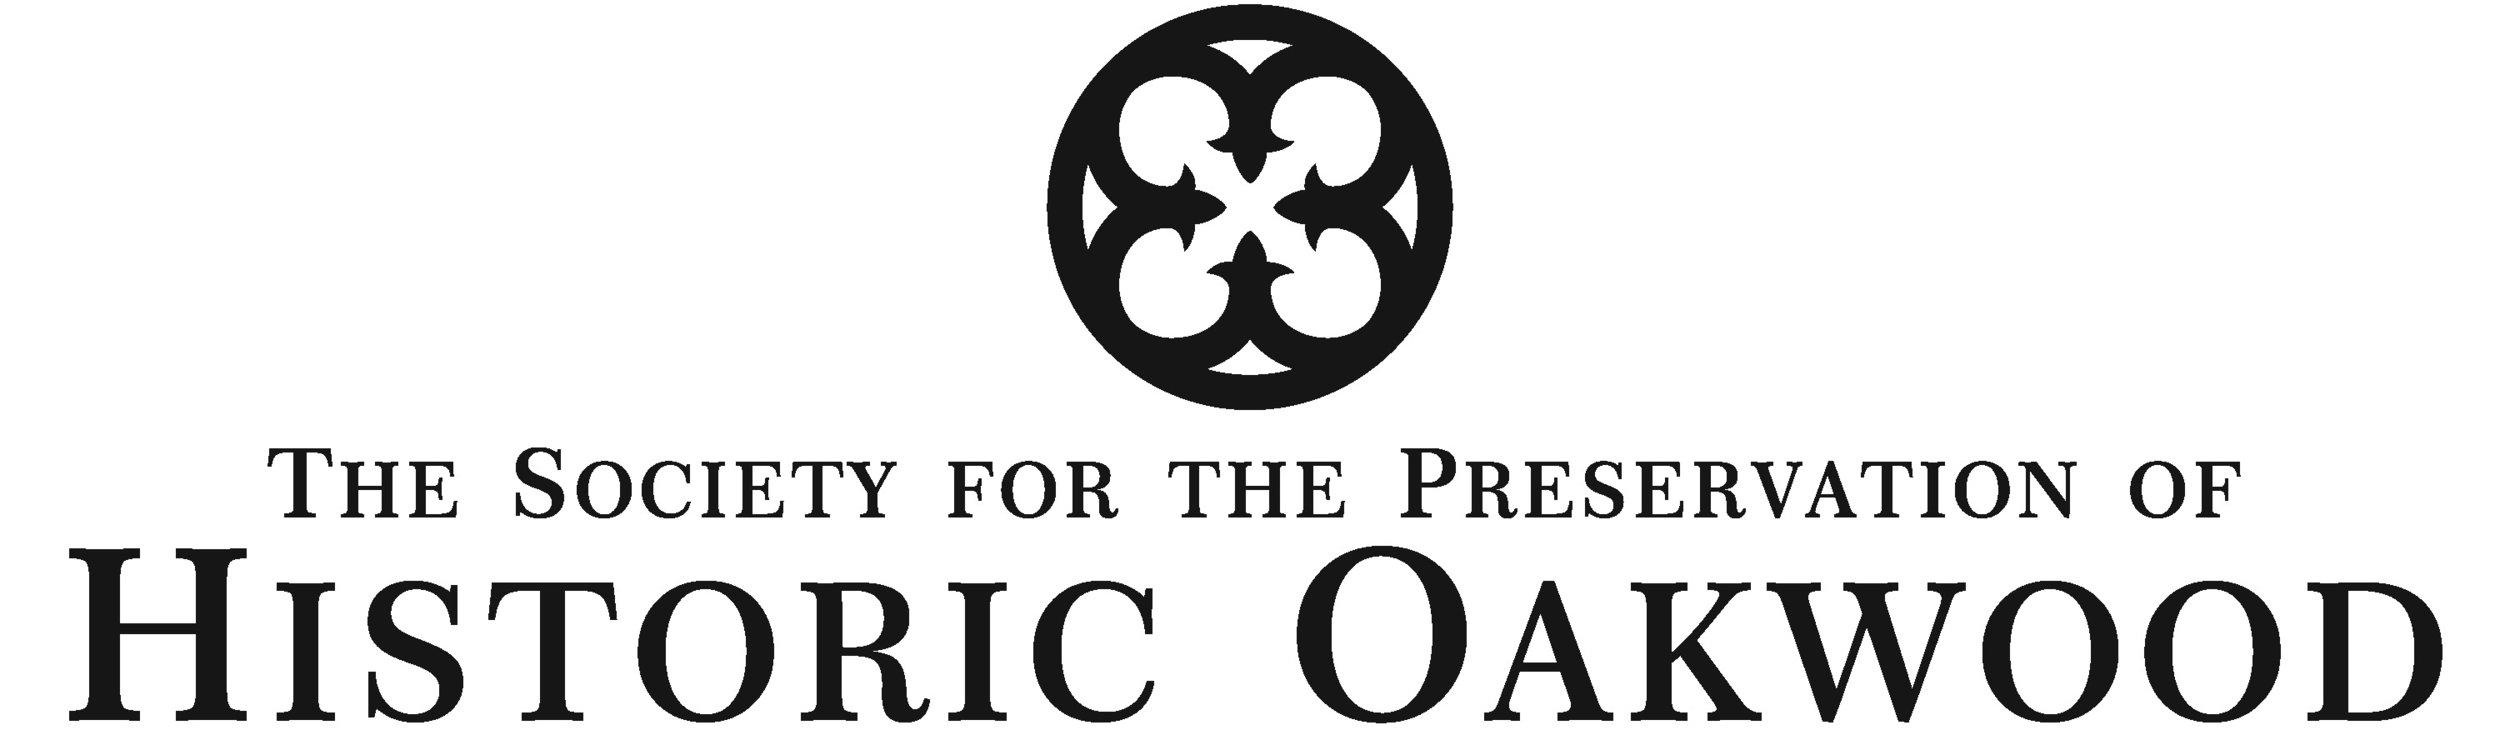 historic oakwood logo.jpg